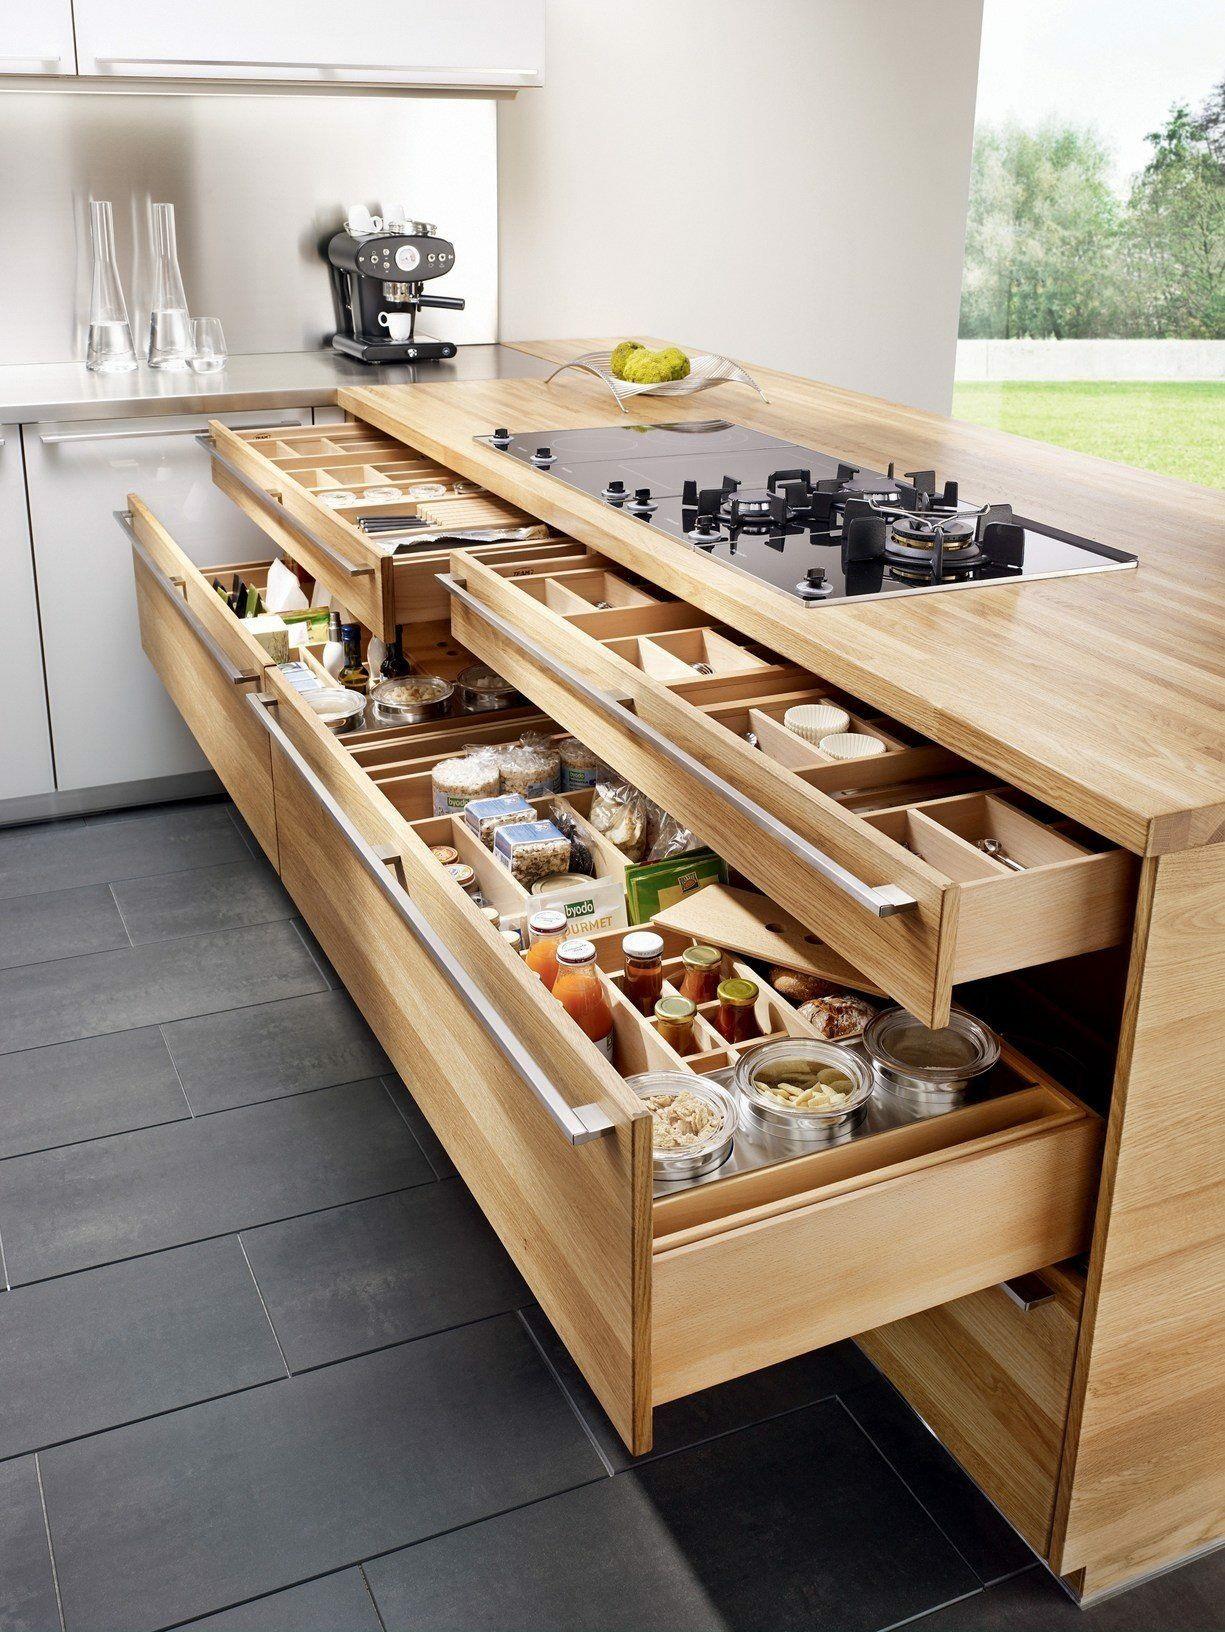 Drawers//Food Storage | Charlotte | Pinterest | Food storage ...